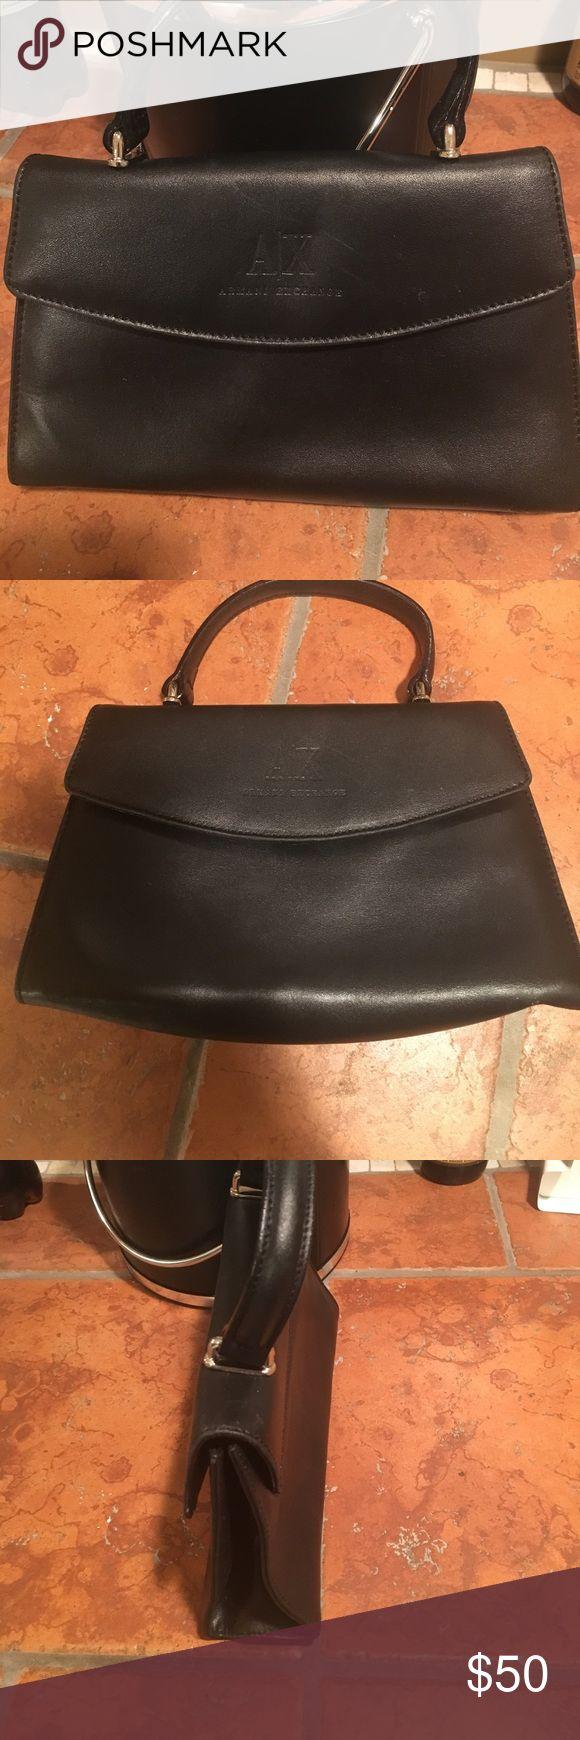 Armani Exchange purse. Small black classic Armani Exchange purse.  Like brand new. A/X Armani Exchange Bags Mini Bags